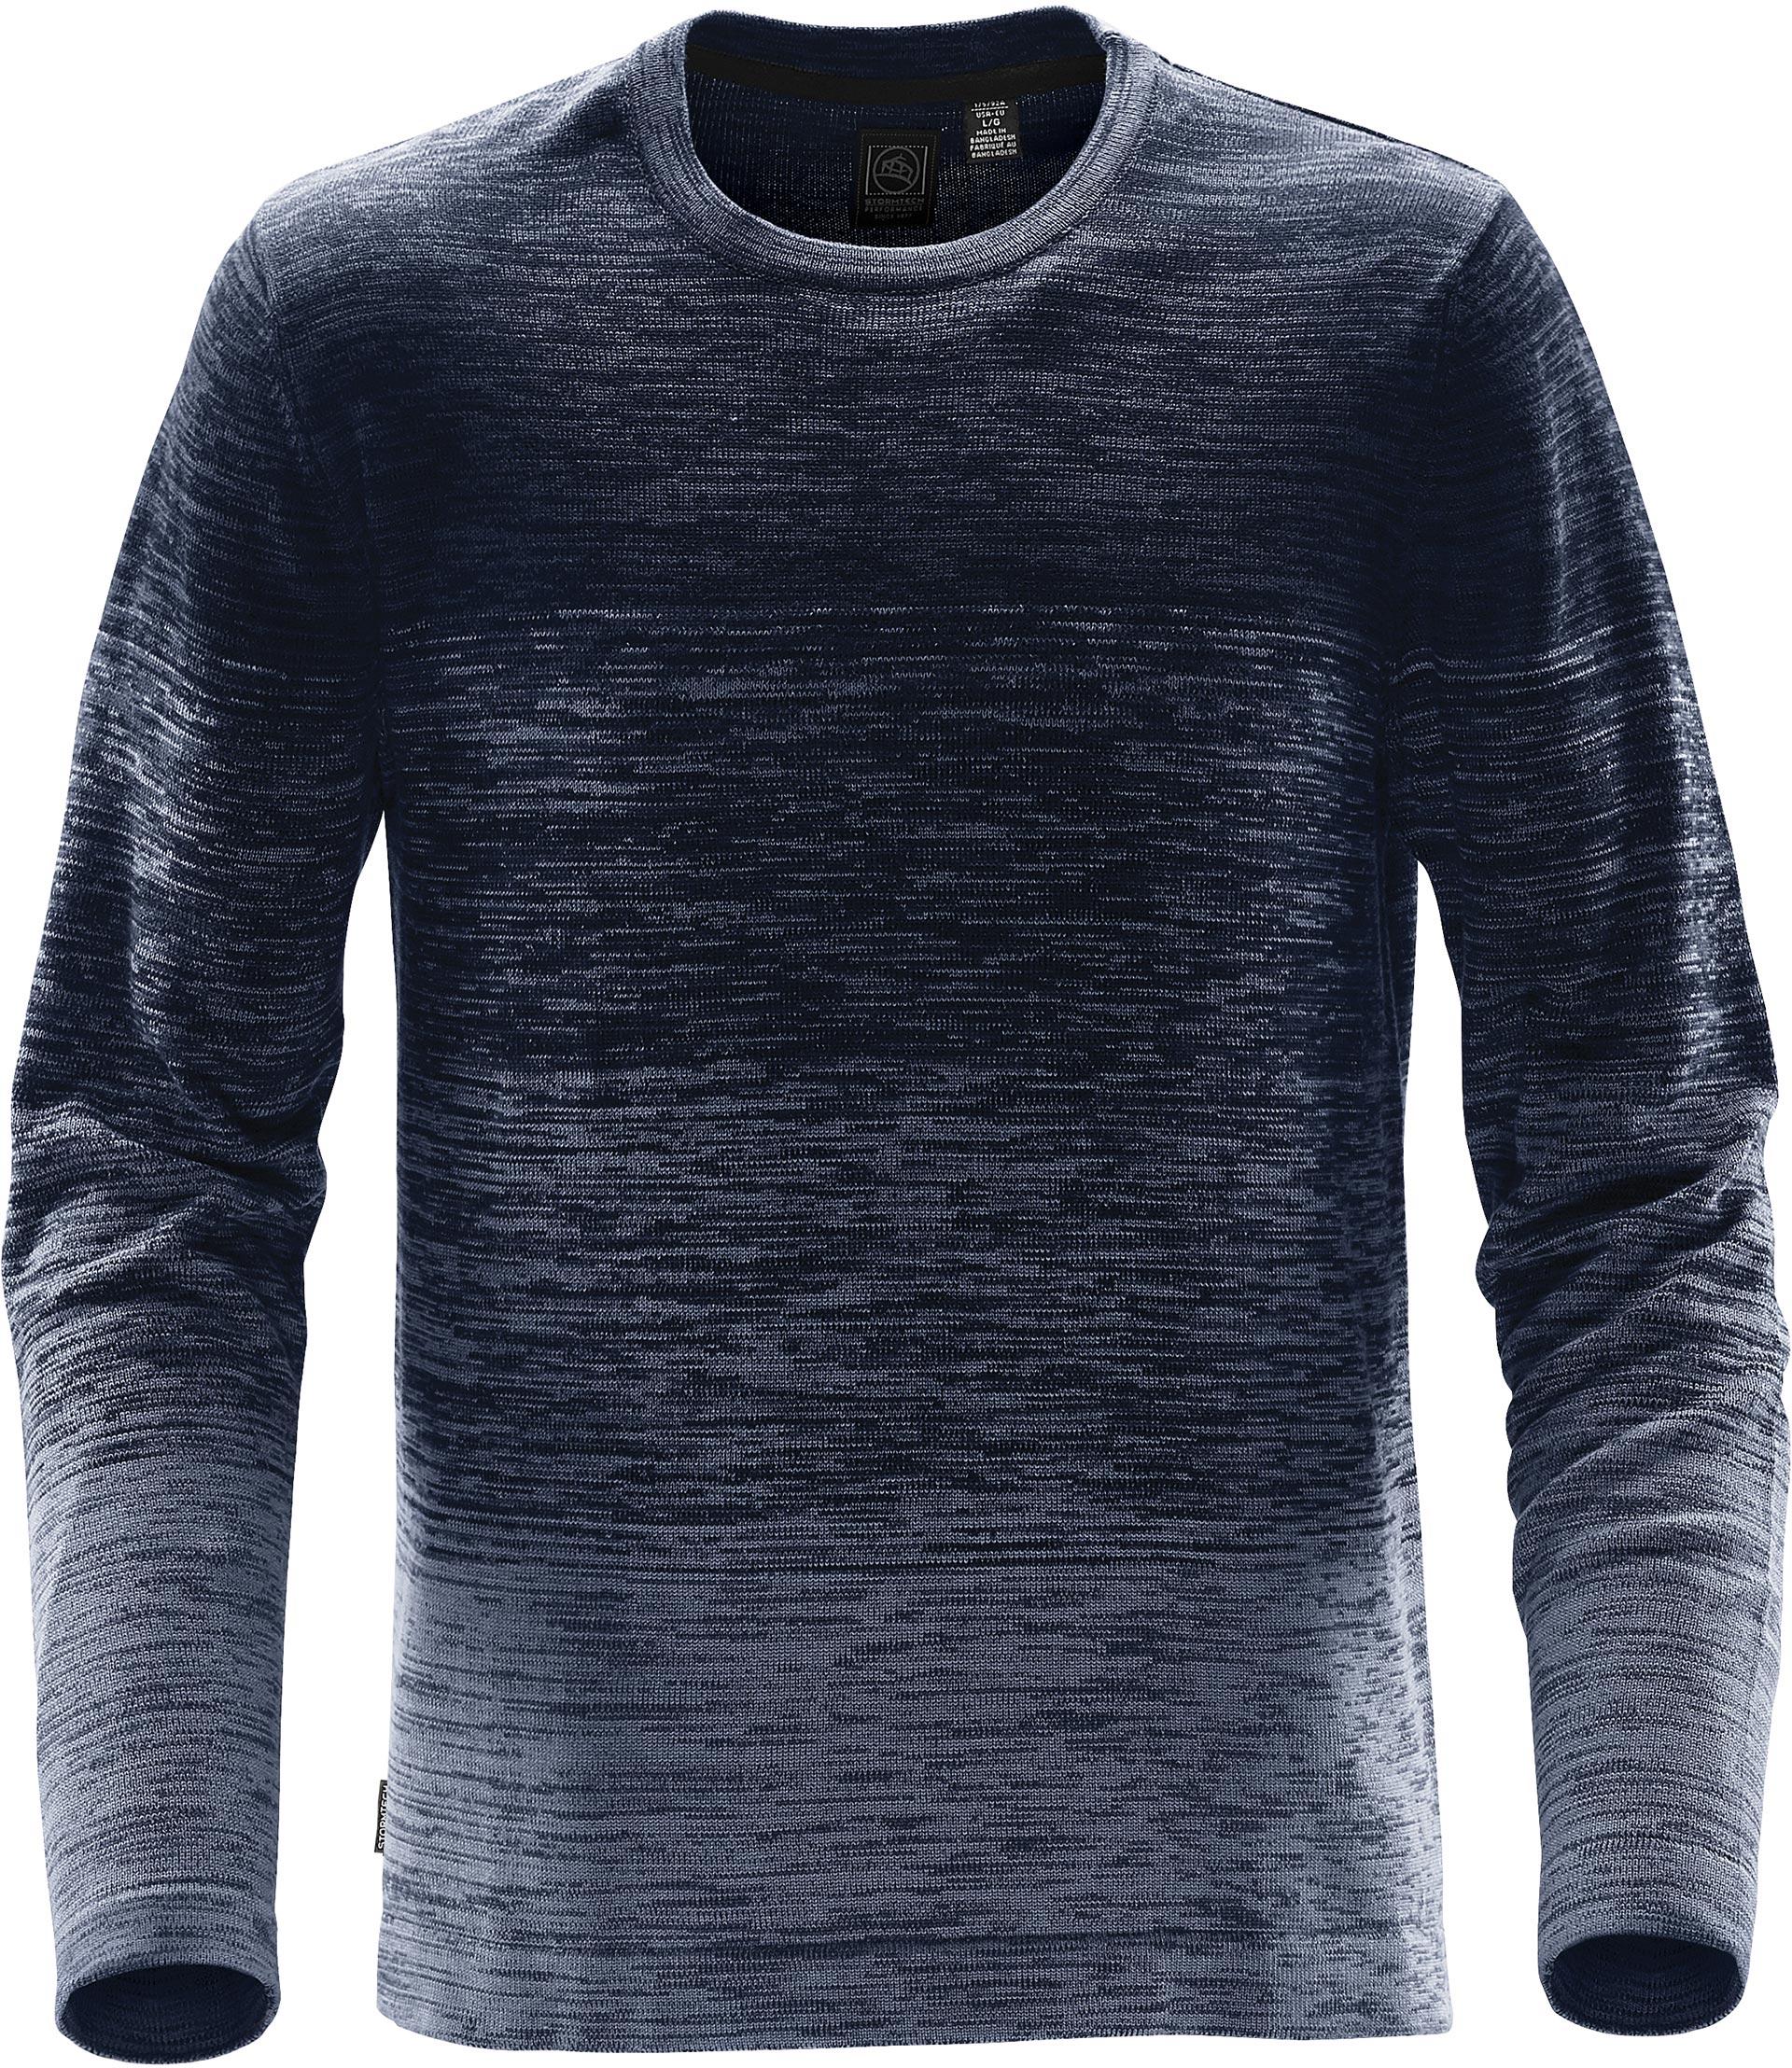 Stormtech VCN-1 - Men's Avalanche Sweater